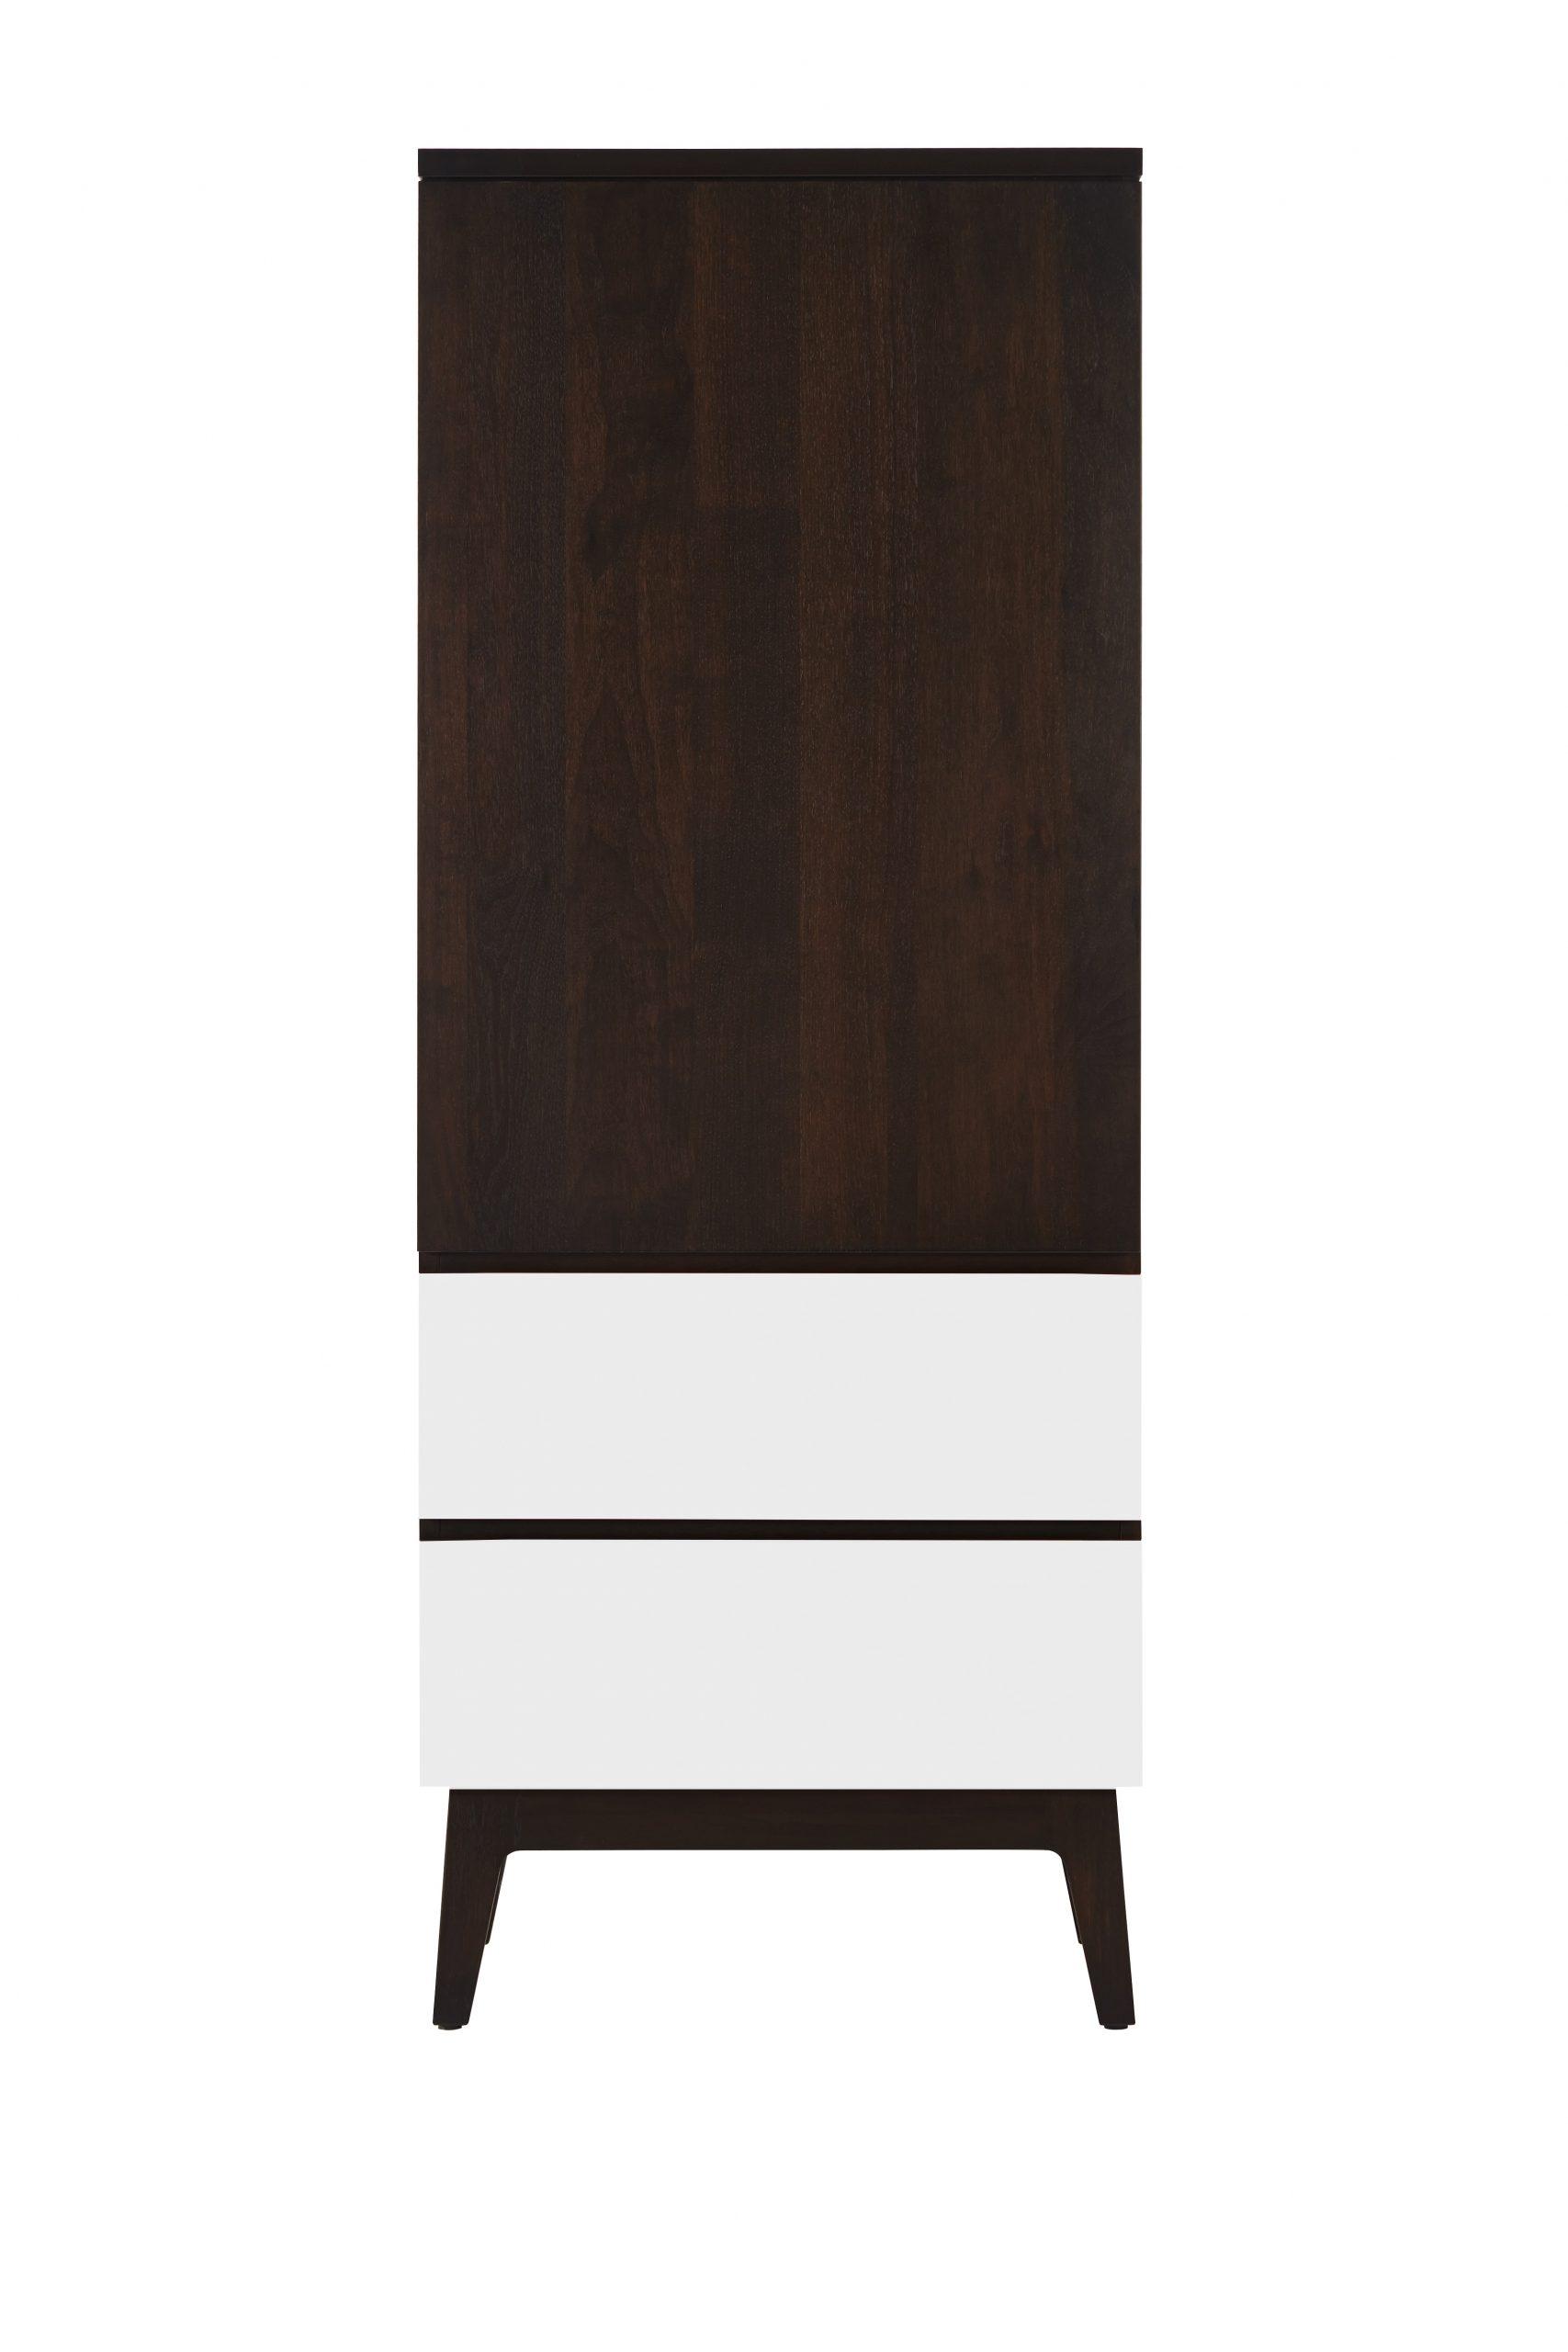 Serra-dressing-tower-coffee-with-MIST-3.jpg